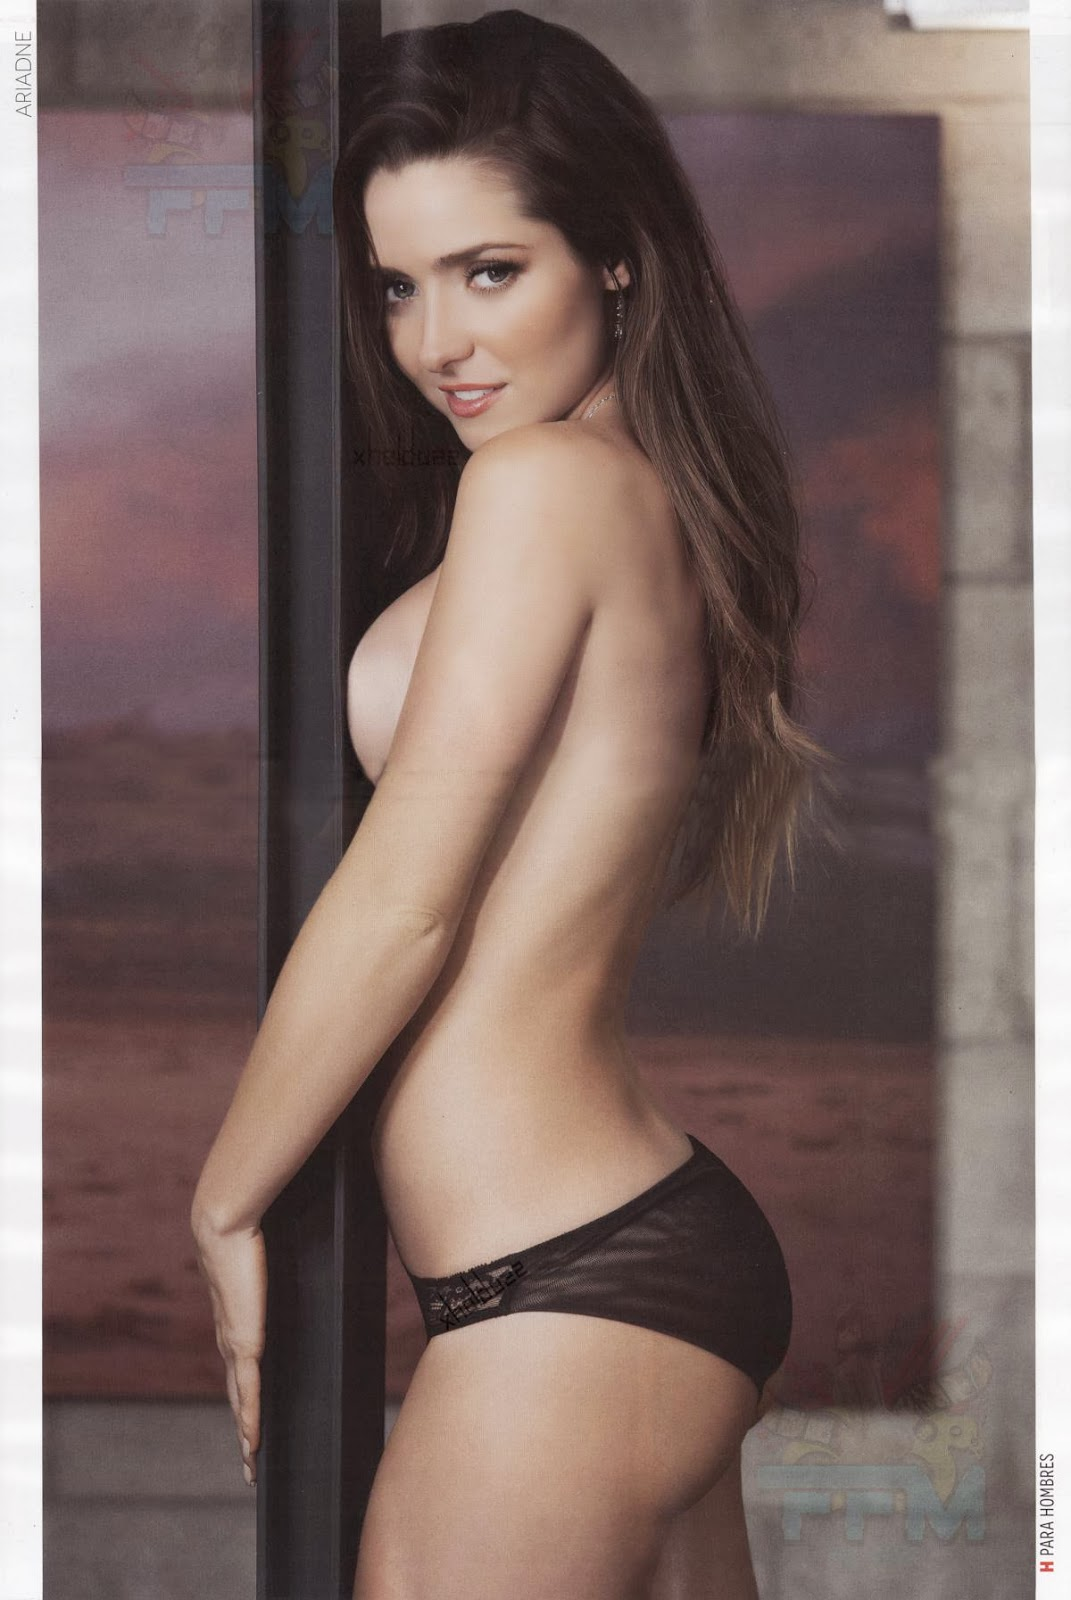 ariadne-diaz-hot-sexy-naked-female-hard-porn